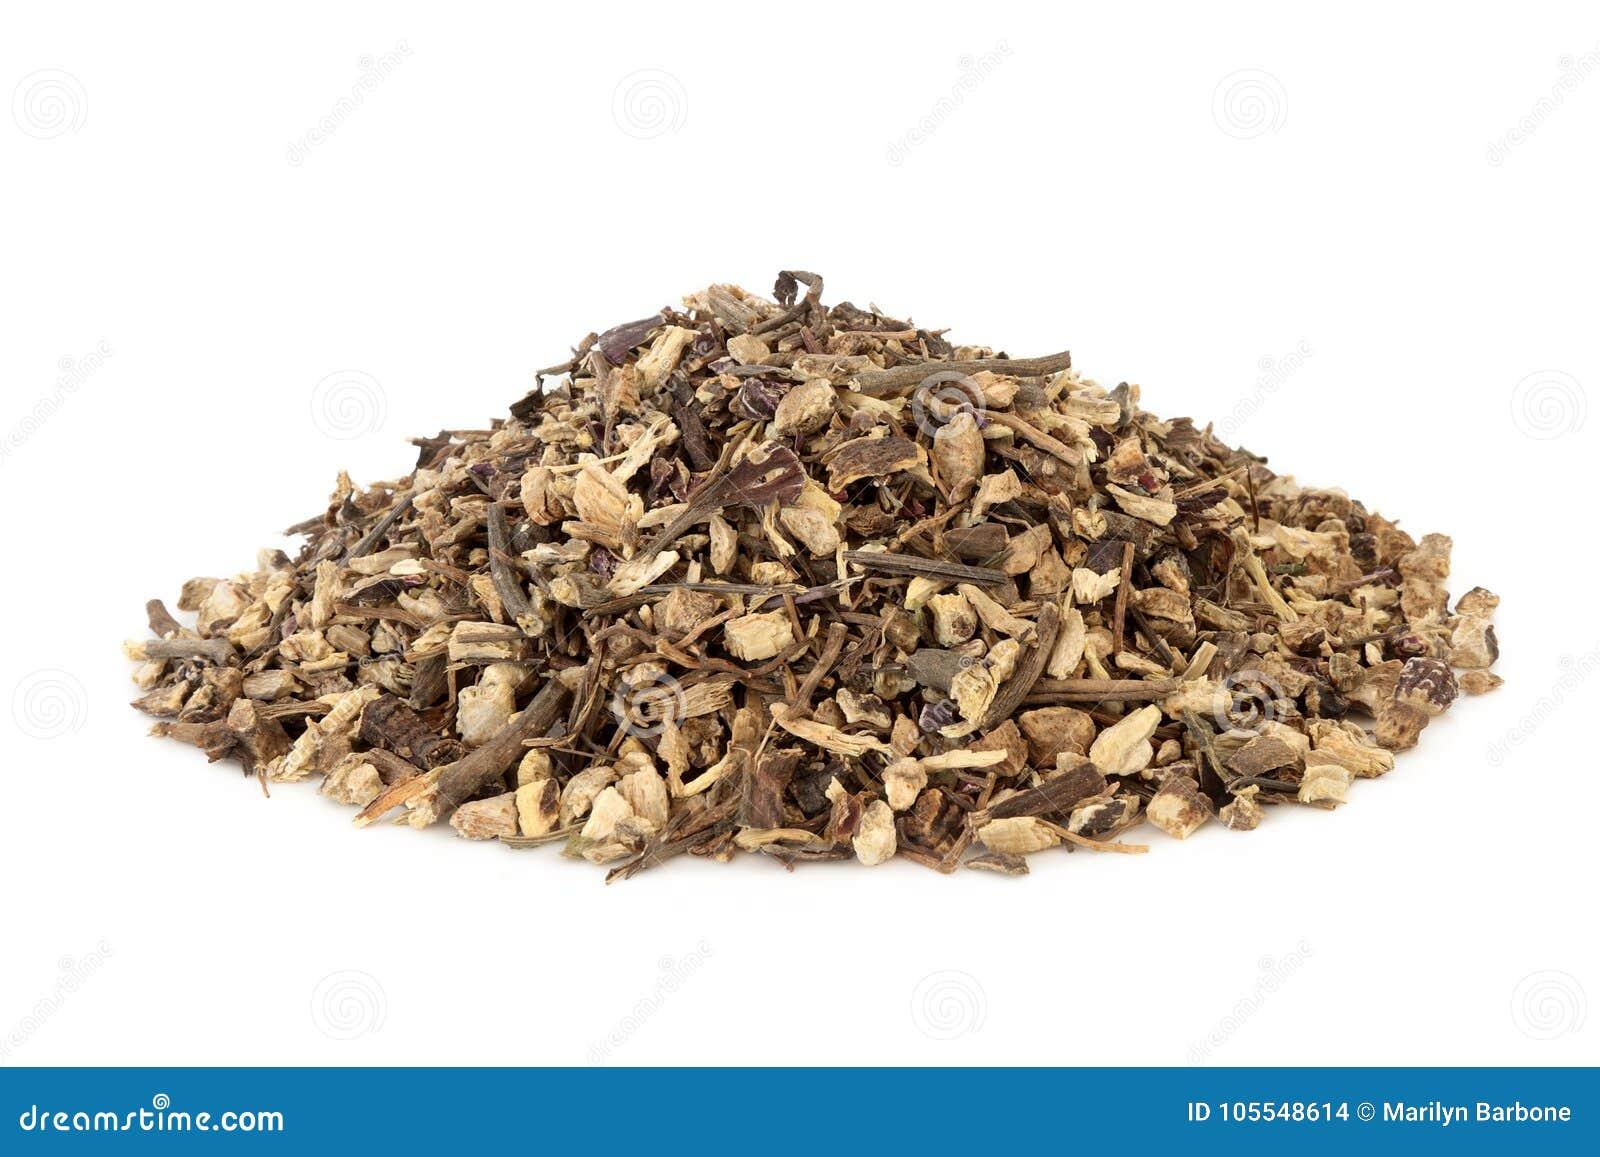 Echinacea Root Herb